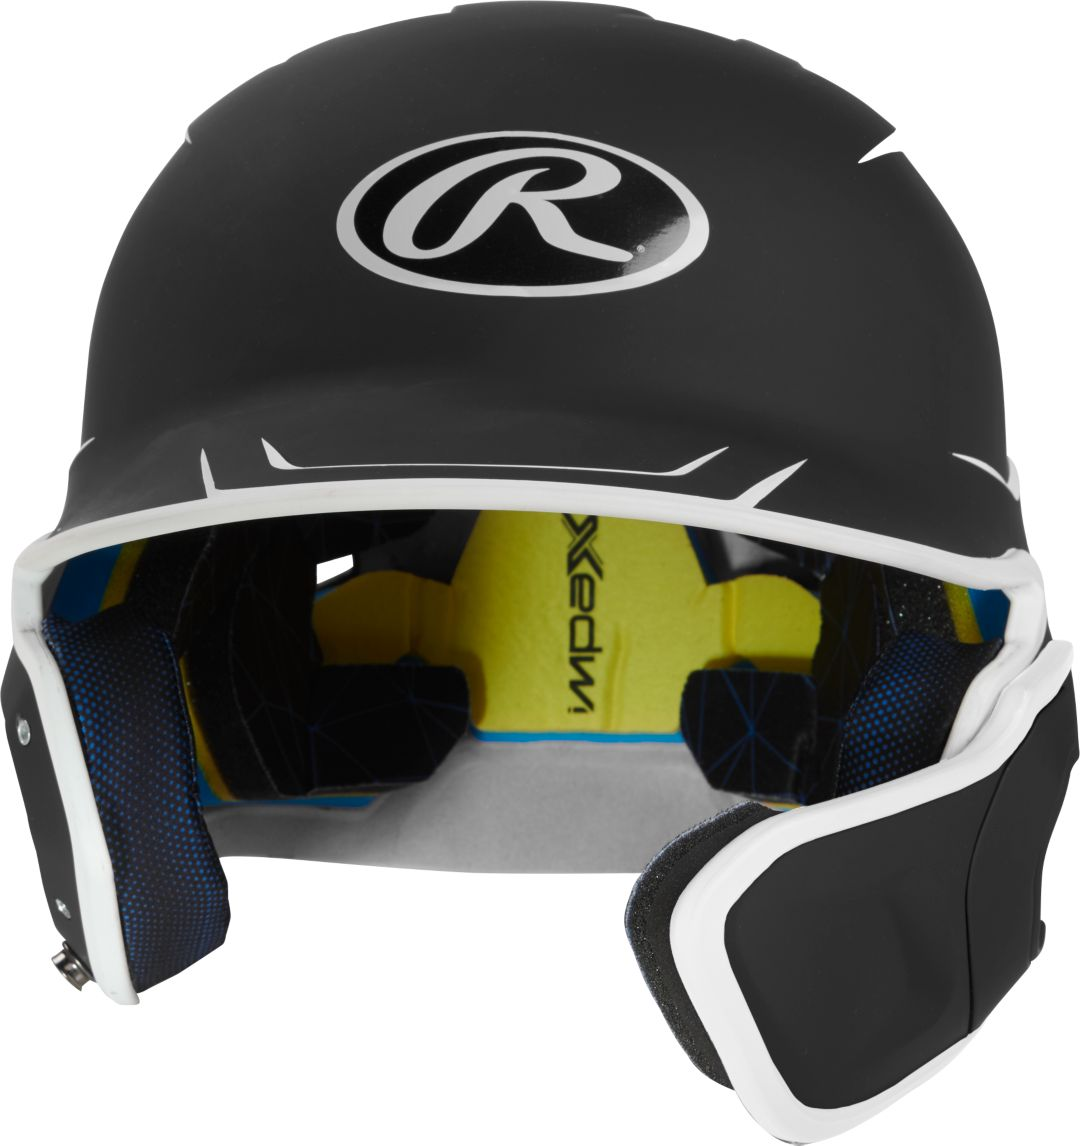 Rawlings 2019 Mach Baseball Batting Helmet Extension